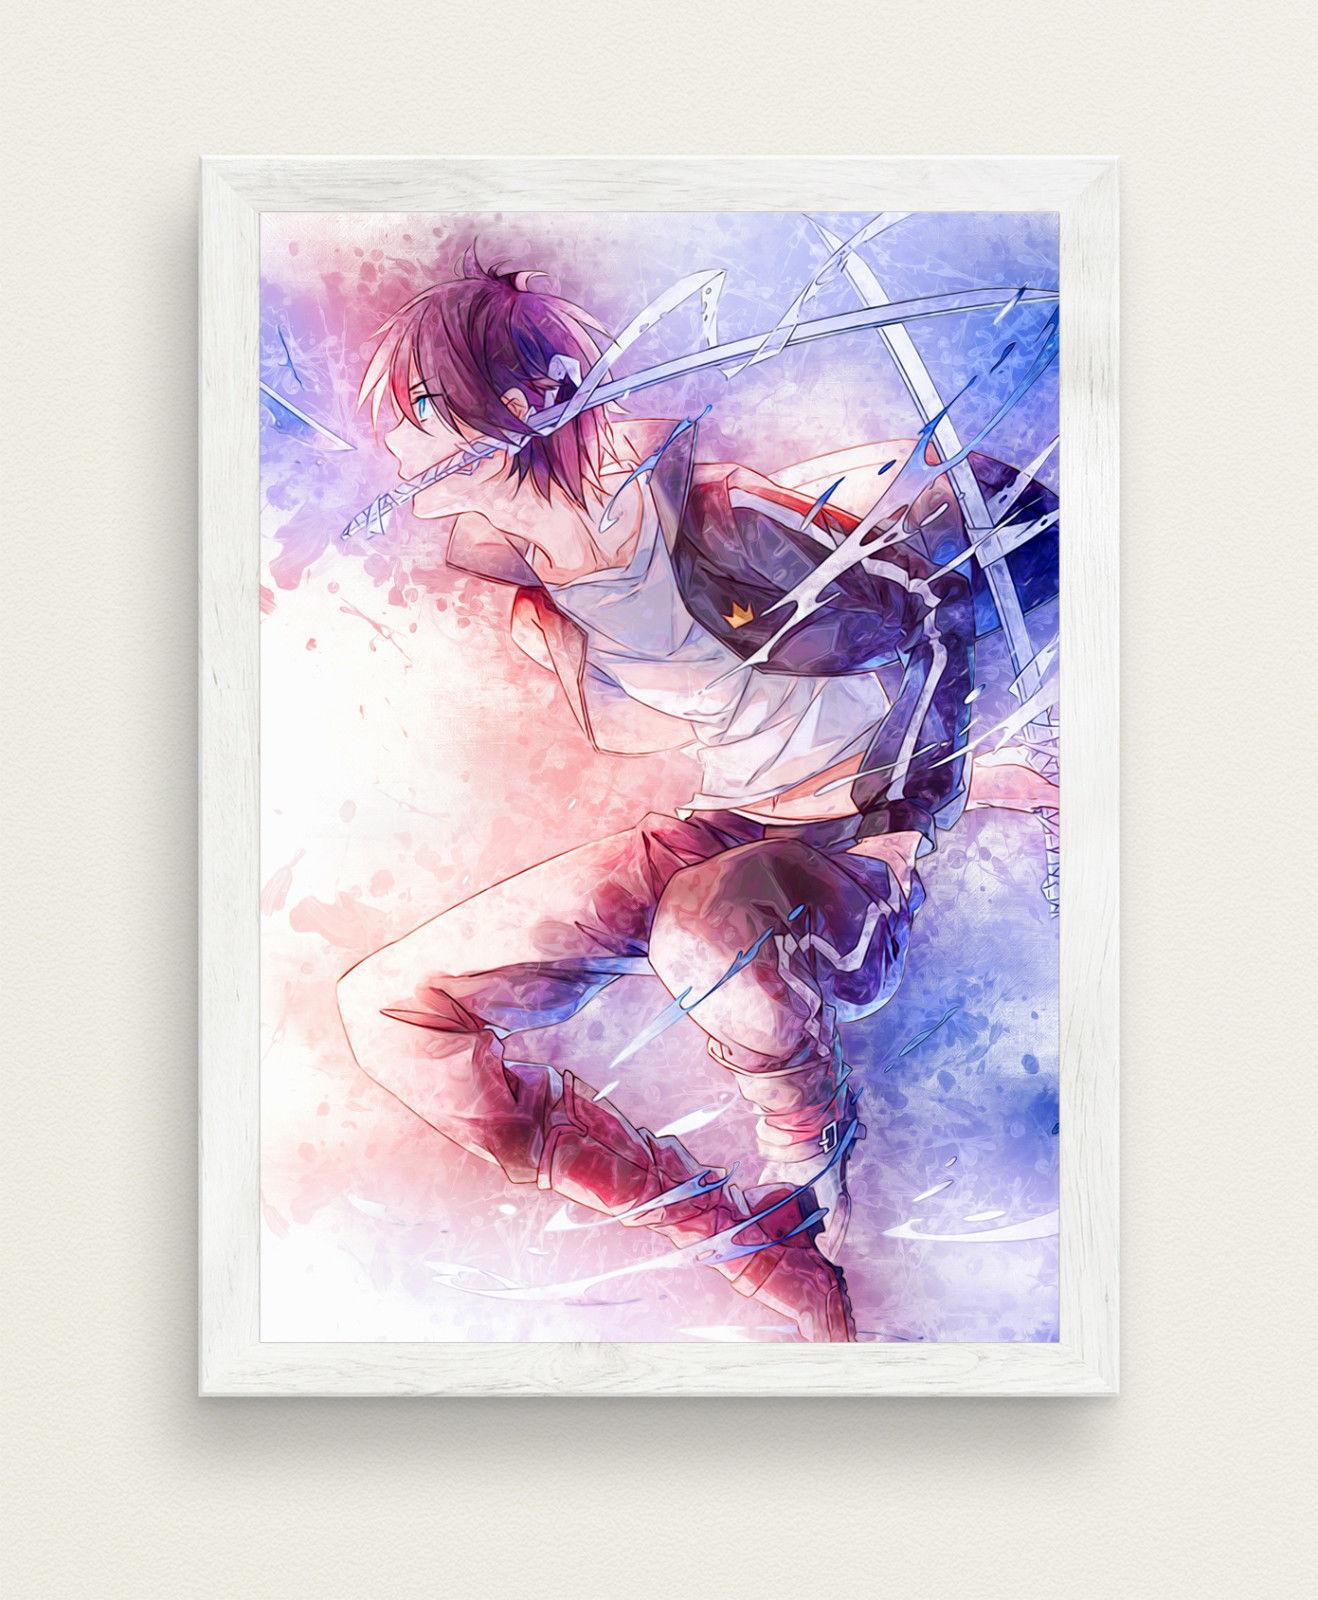 1318x1600 Noragami Watercolor Poster Anime Poster Big Size 33x47 Gift Otaku